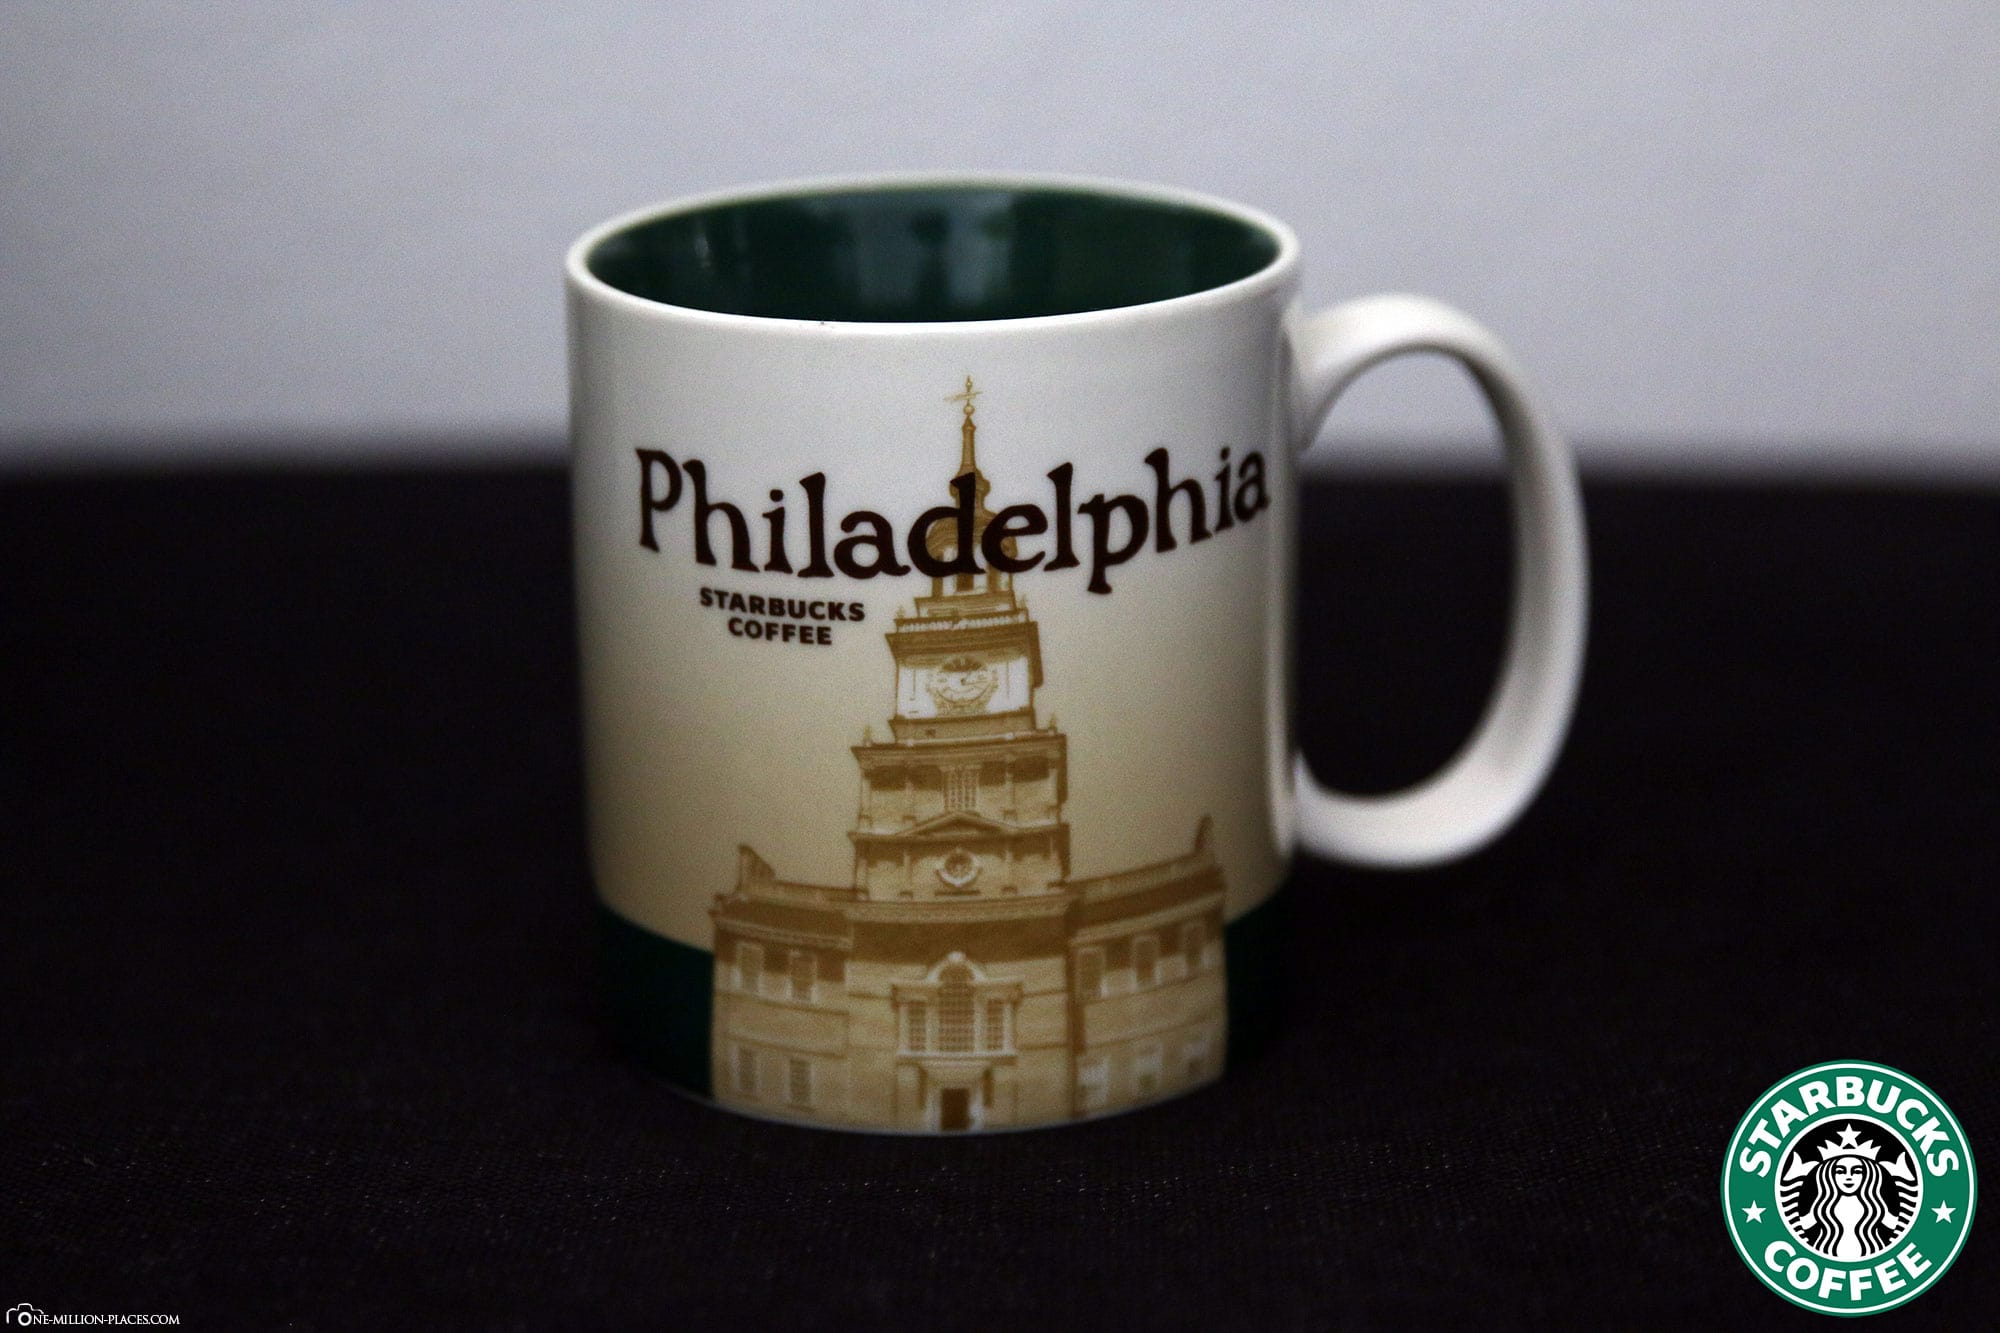 Philadelphia, Starbucks Cup, Global Icon Series, City Mugs, Collection, USA, Travelreport